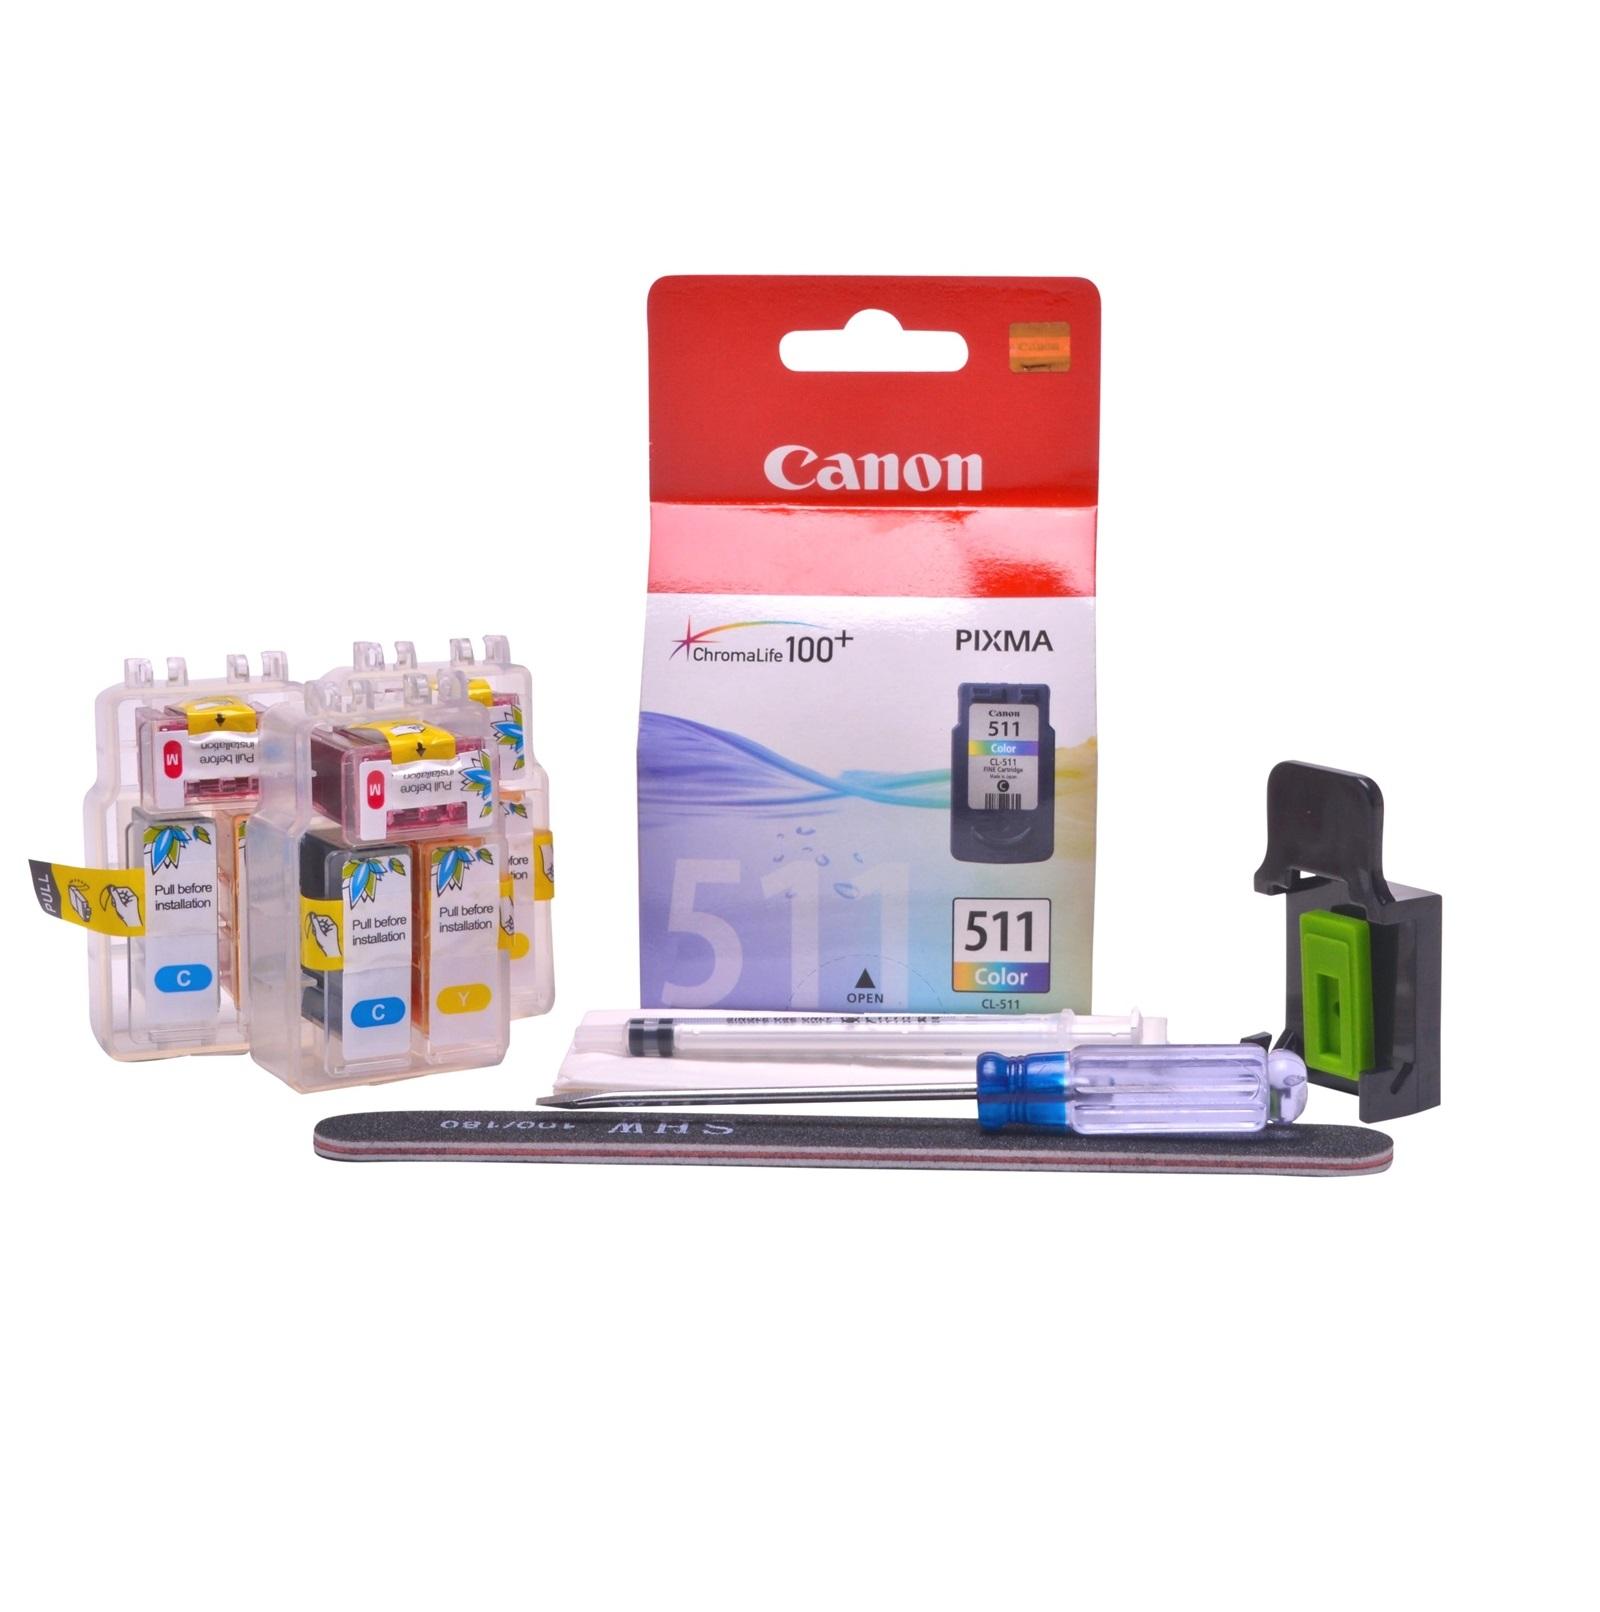 Refillable CL-513 Colour Pod Cheap printer cartridges for Canon Pixma MP240 CL-511 dye ink